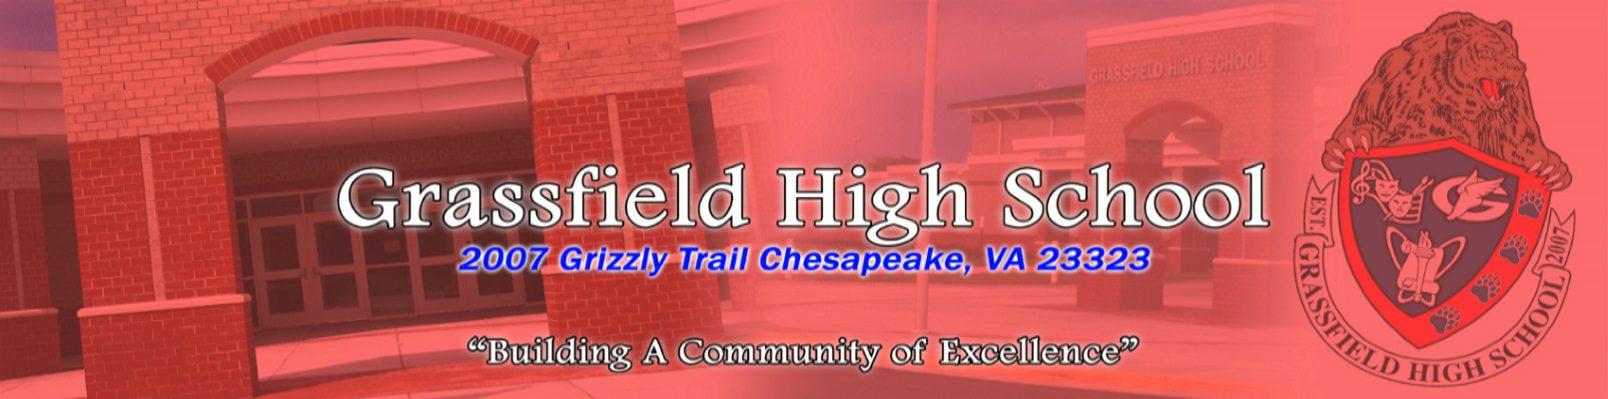 Grassfield High School